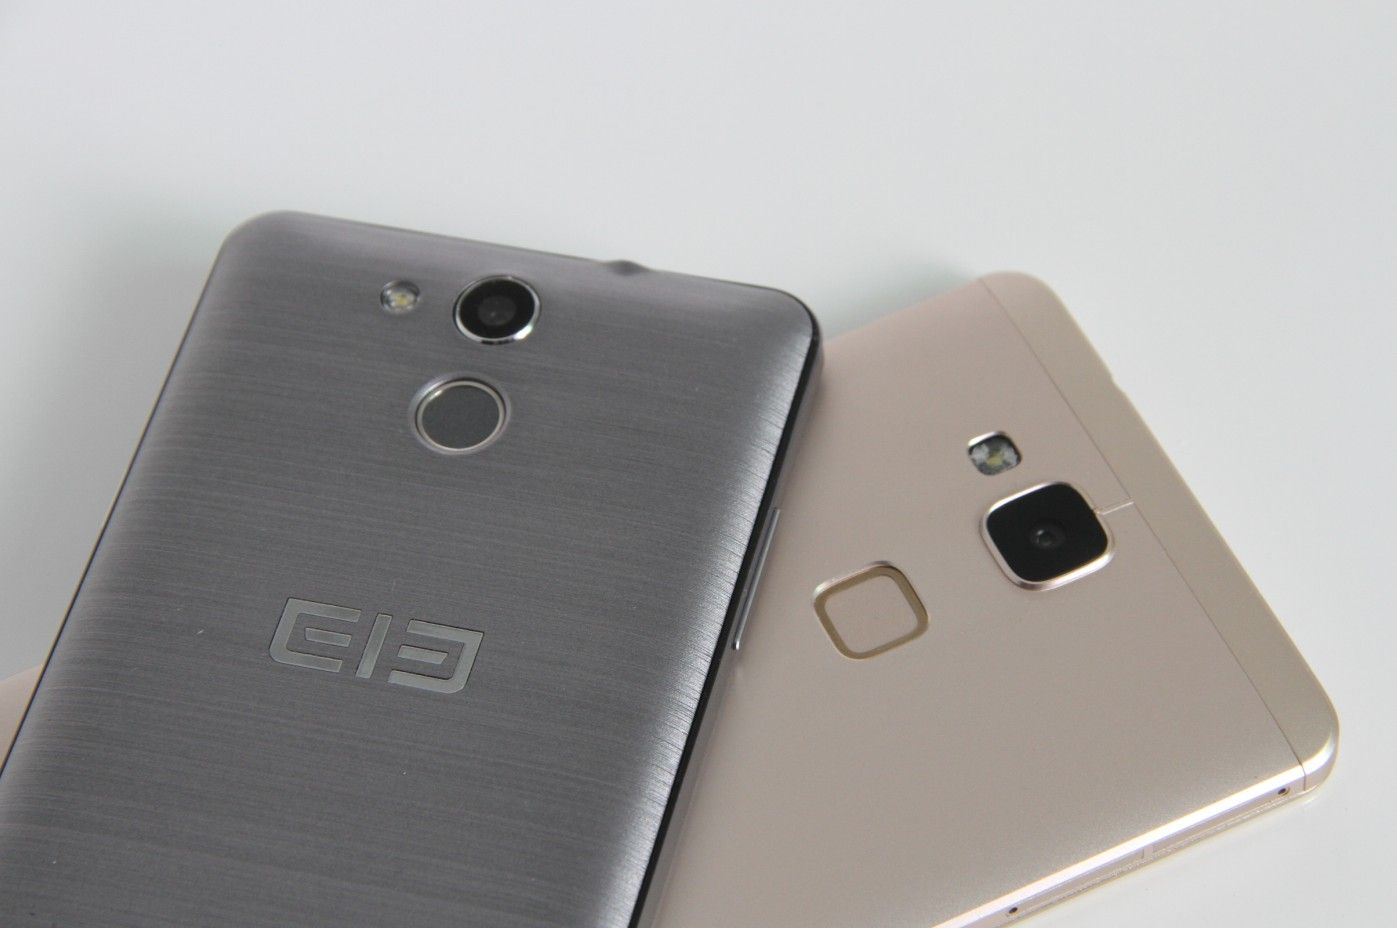 17 efox, Elephone, flash sales, mercado mobile, smartphone